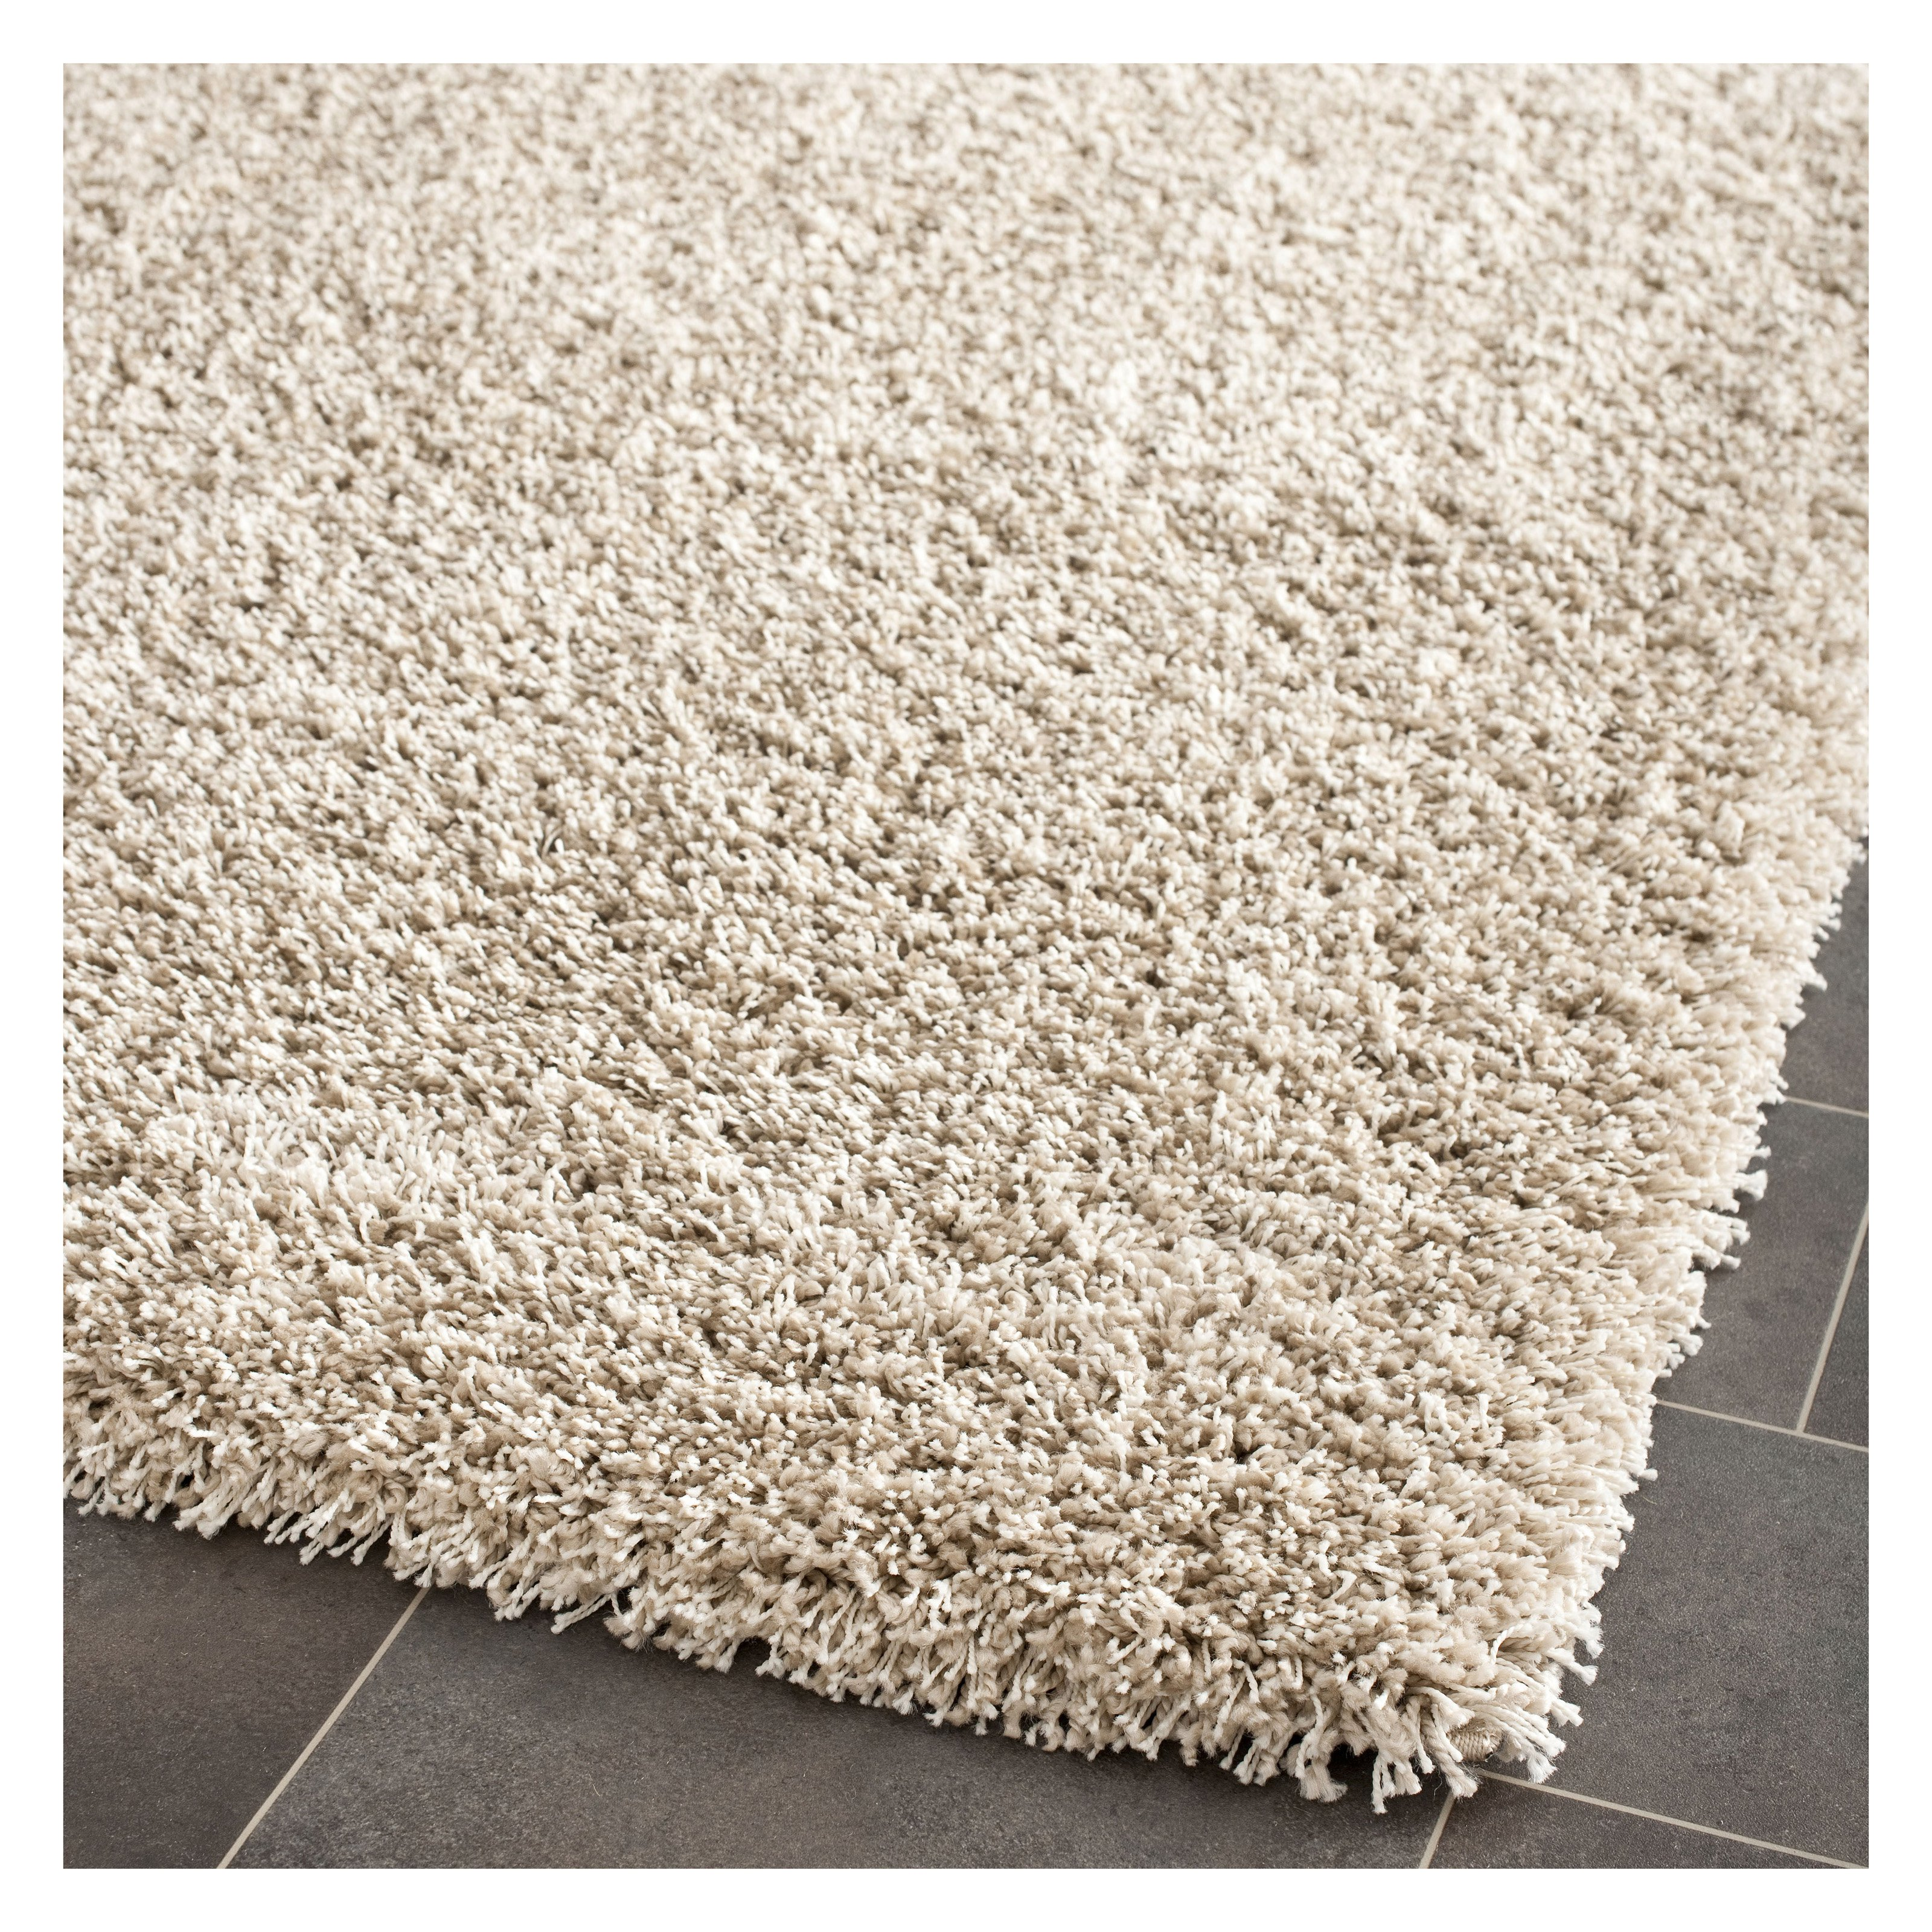 shag rugs safavieh sg151 shag rug | hayneedle EOWSFVN